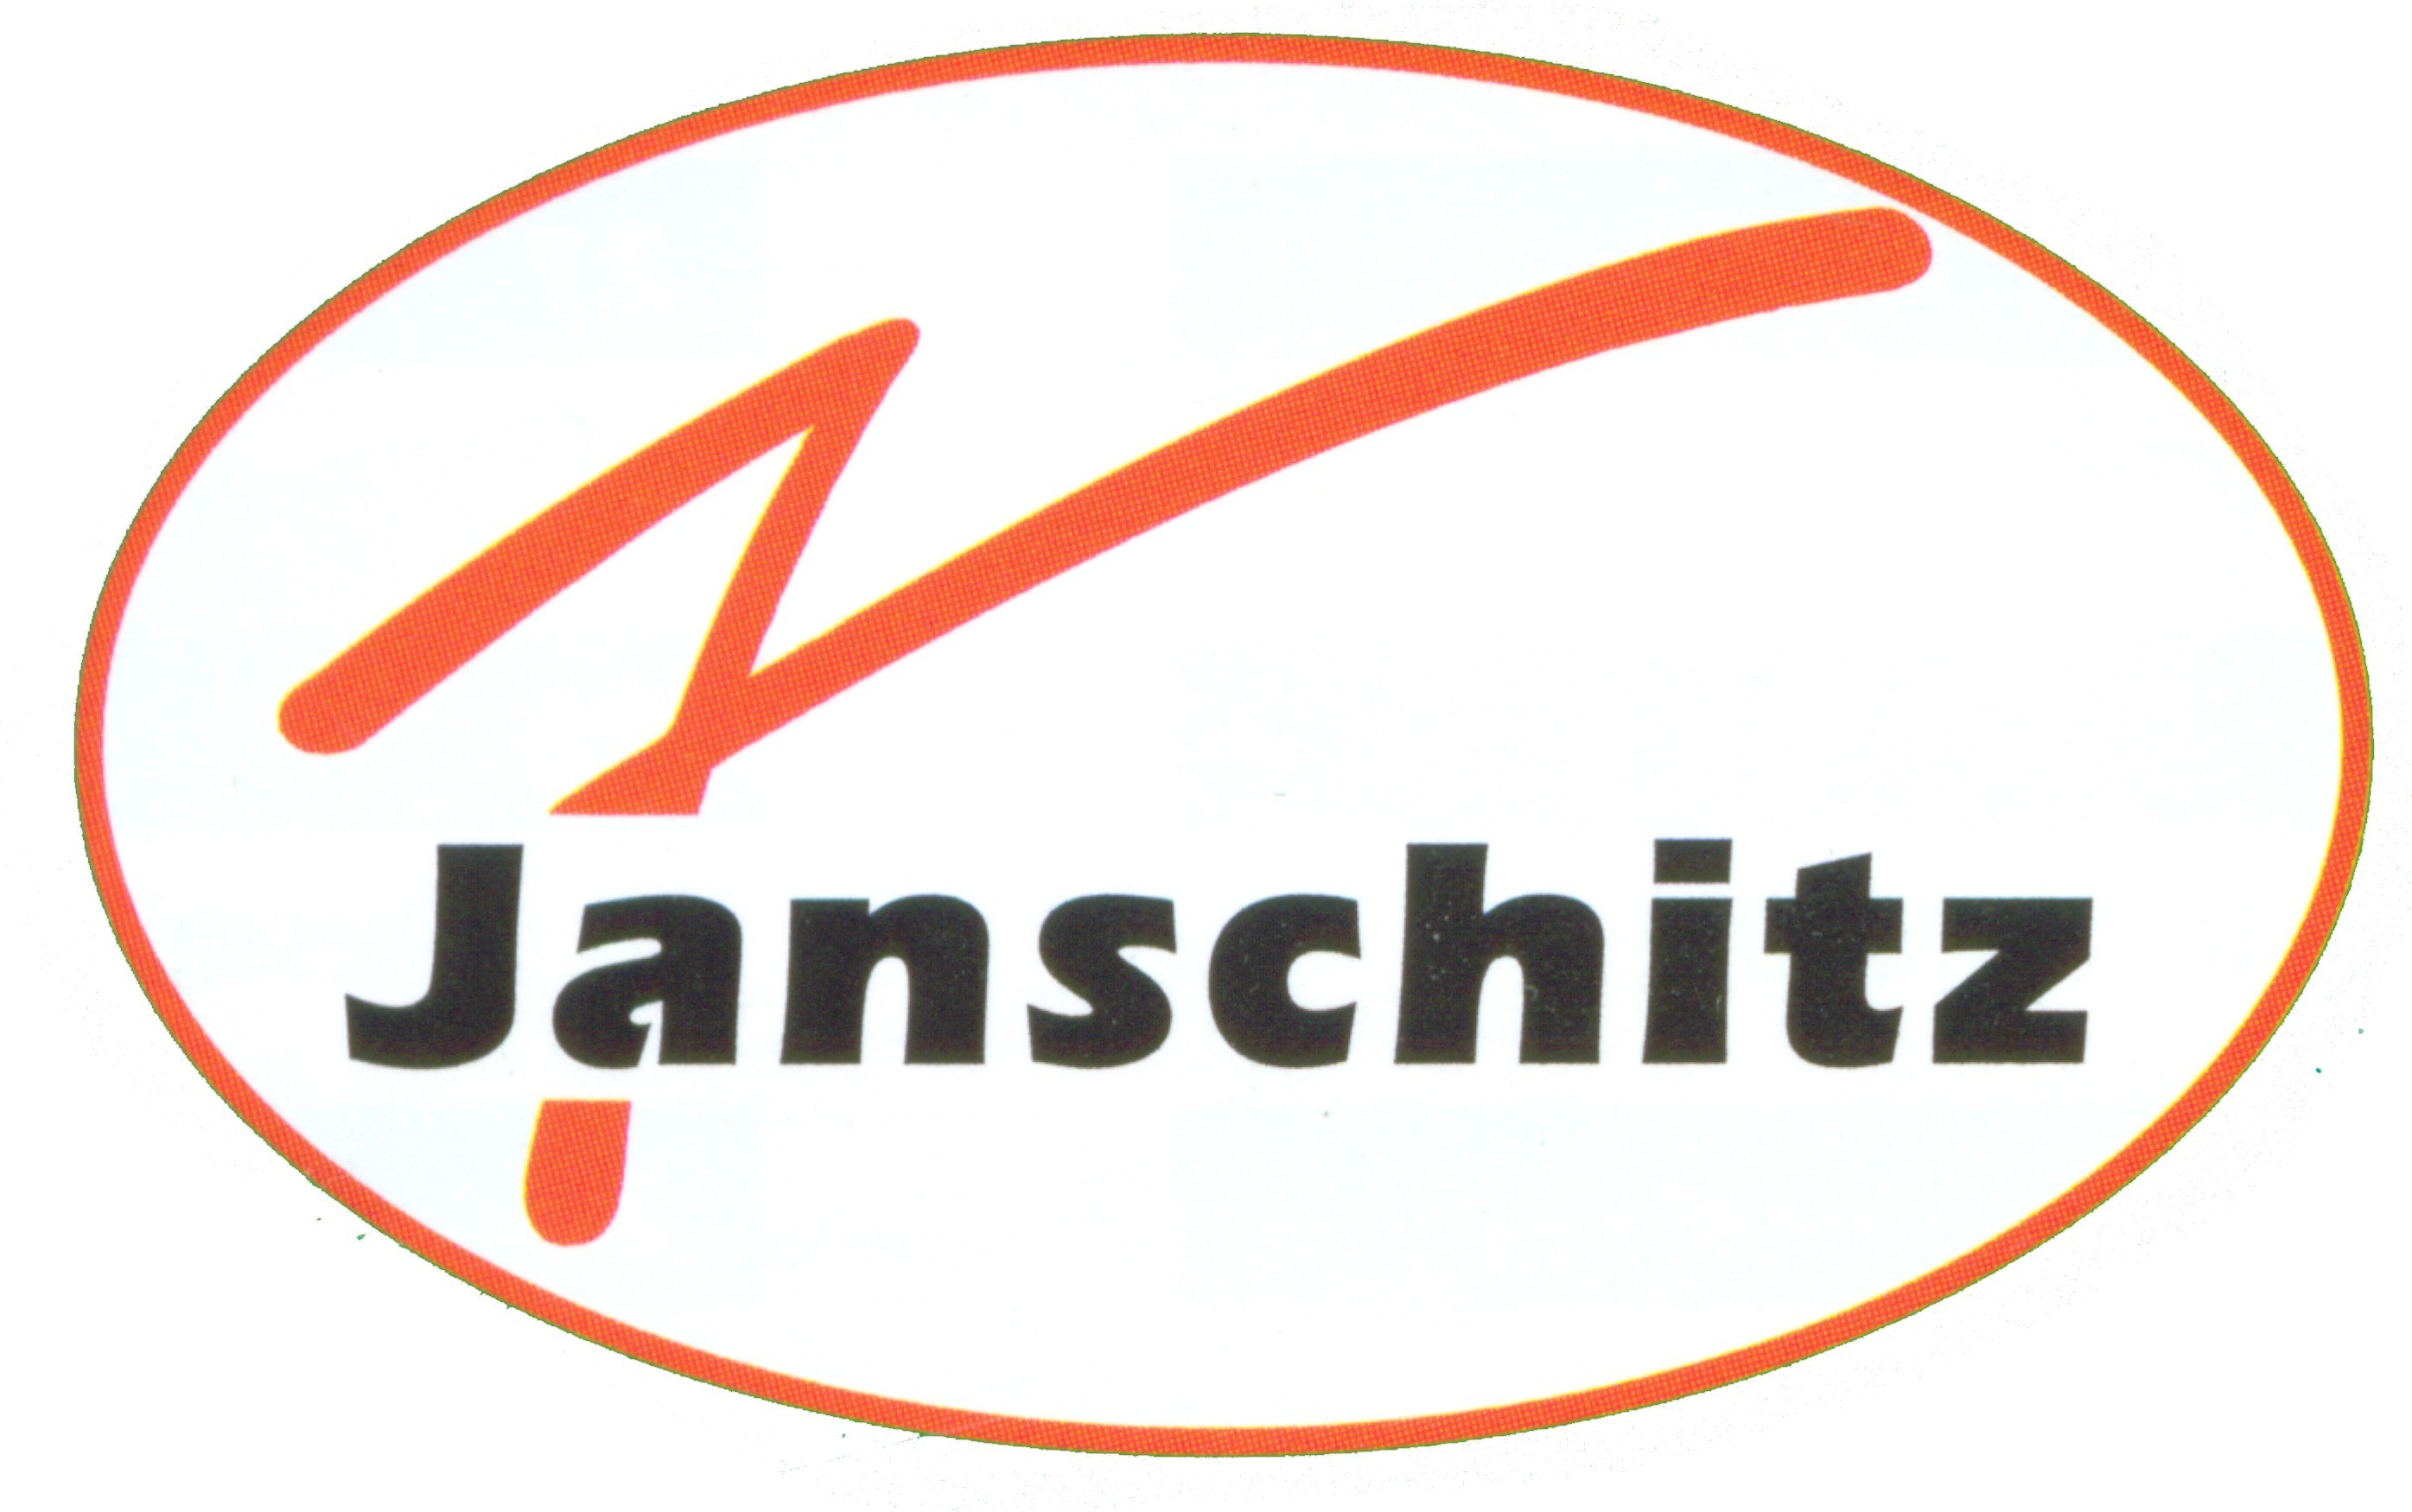 Franz Janschitz